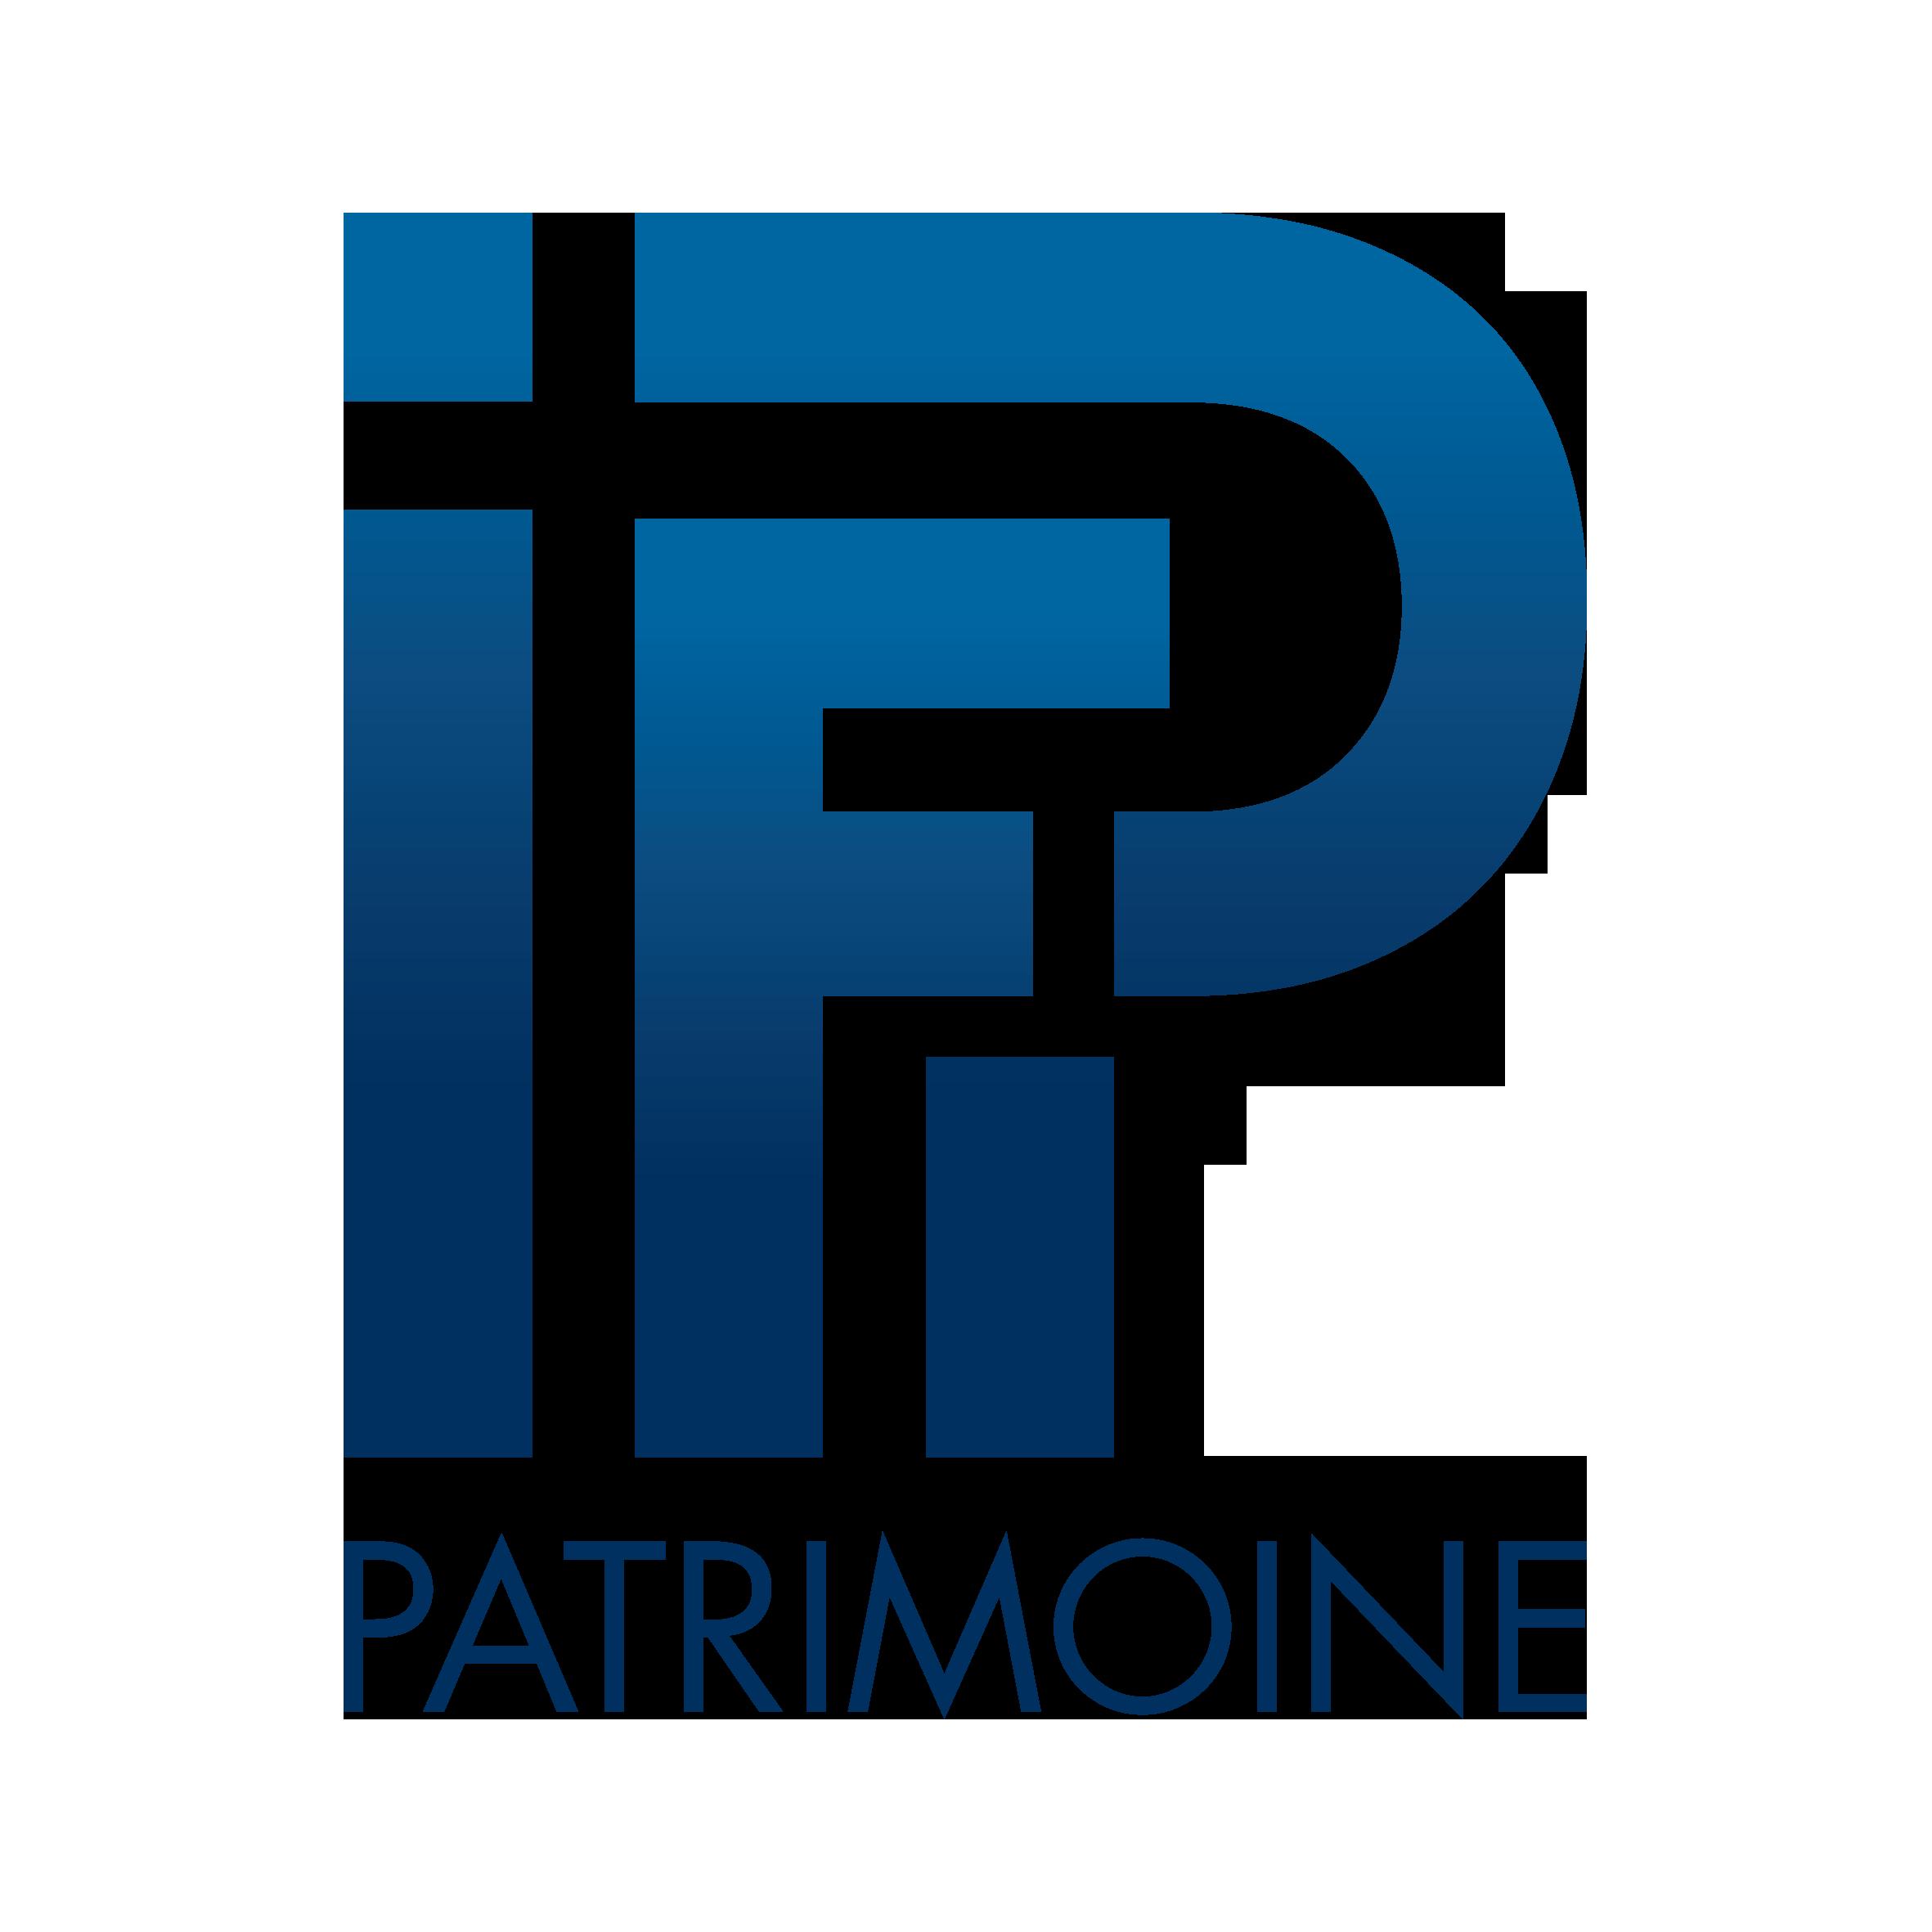 IFP Patrimoine